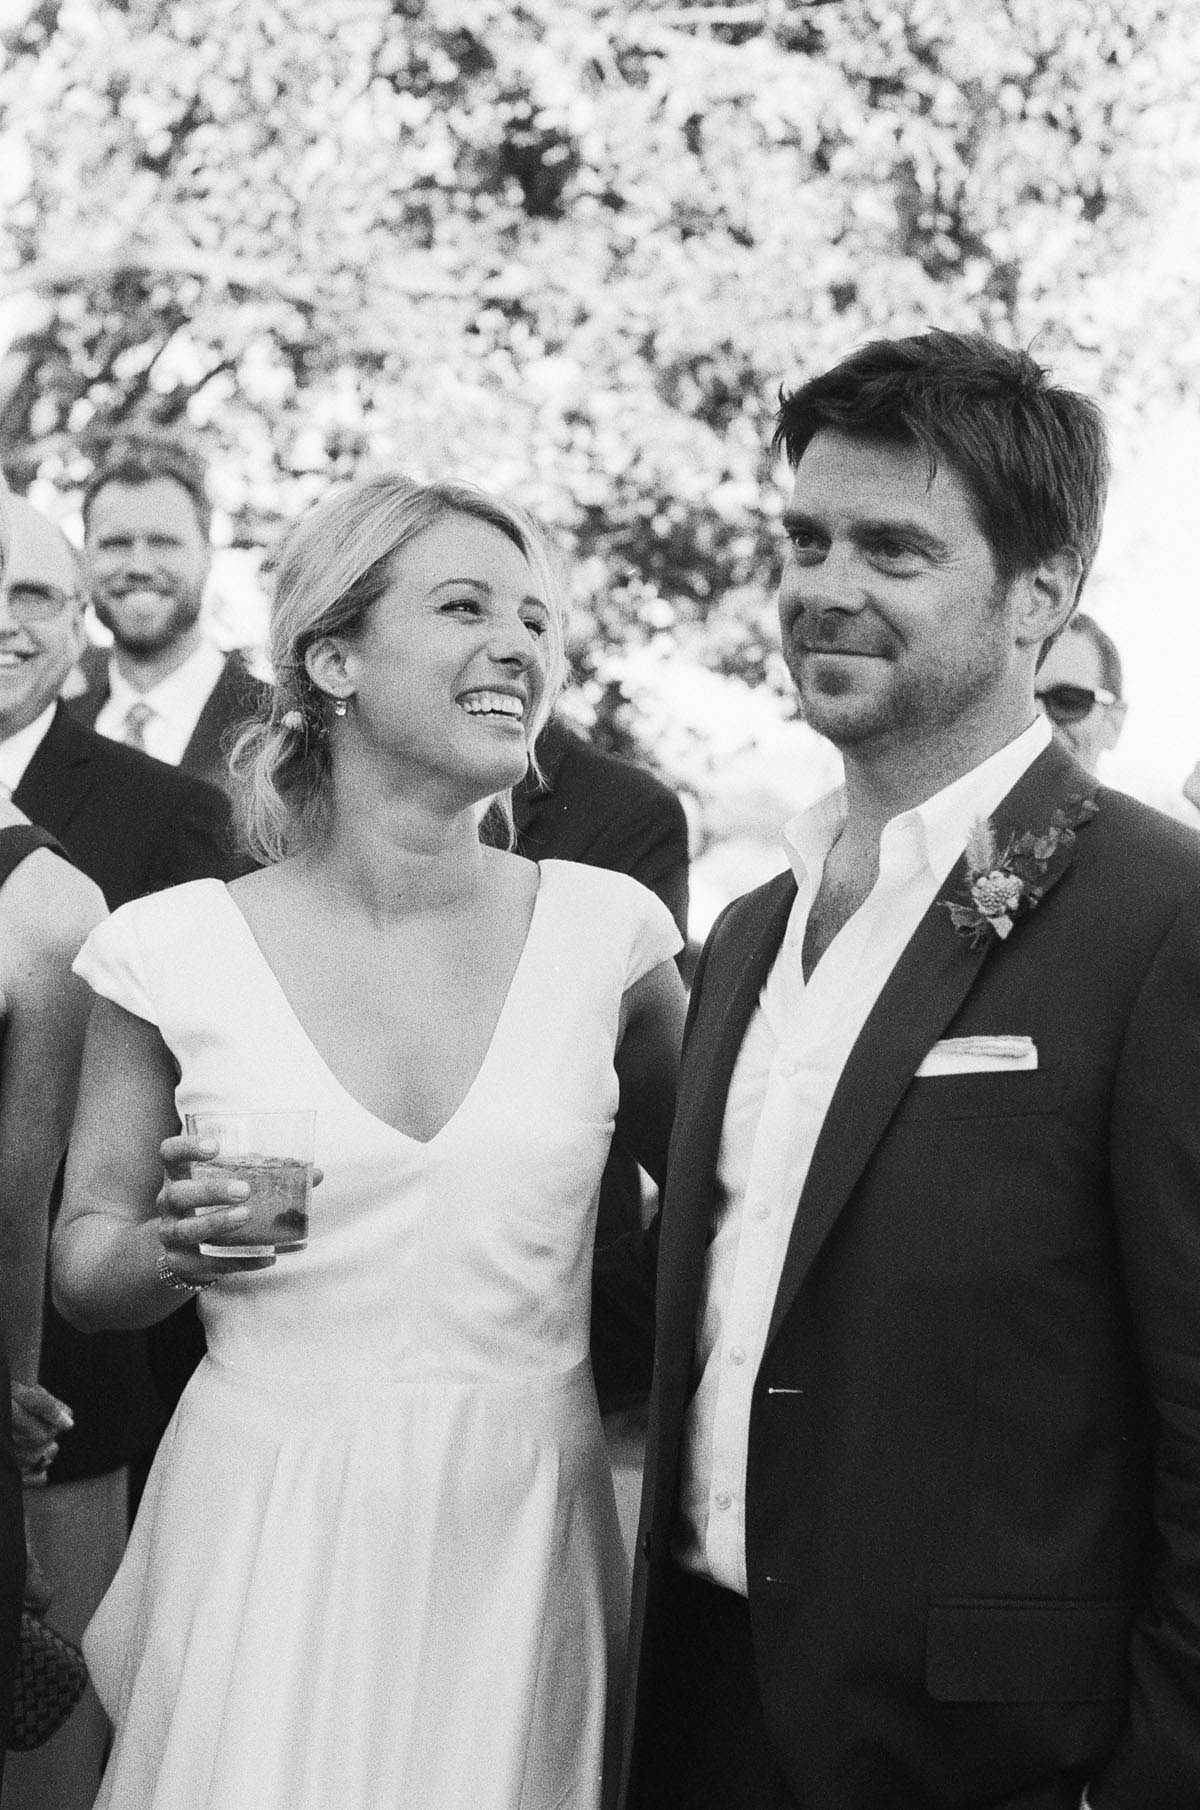 34-bride-groom-happiness.jpg